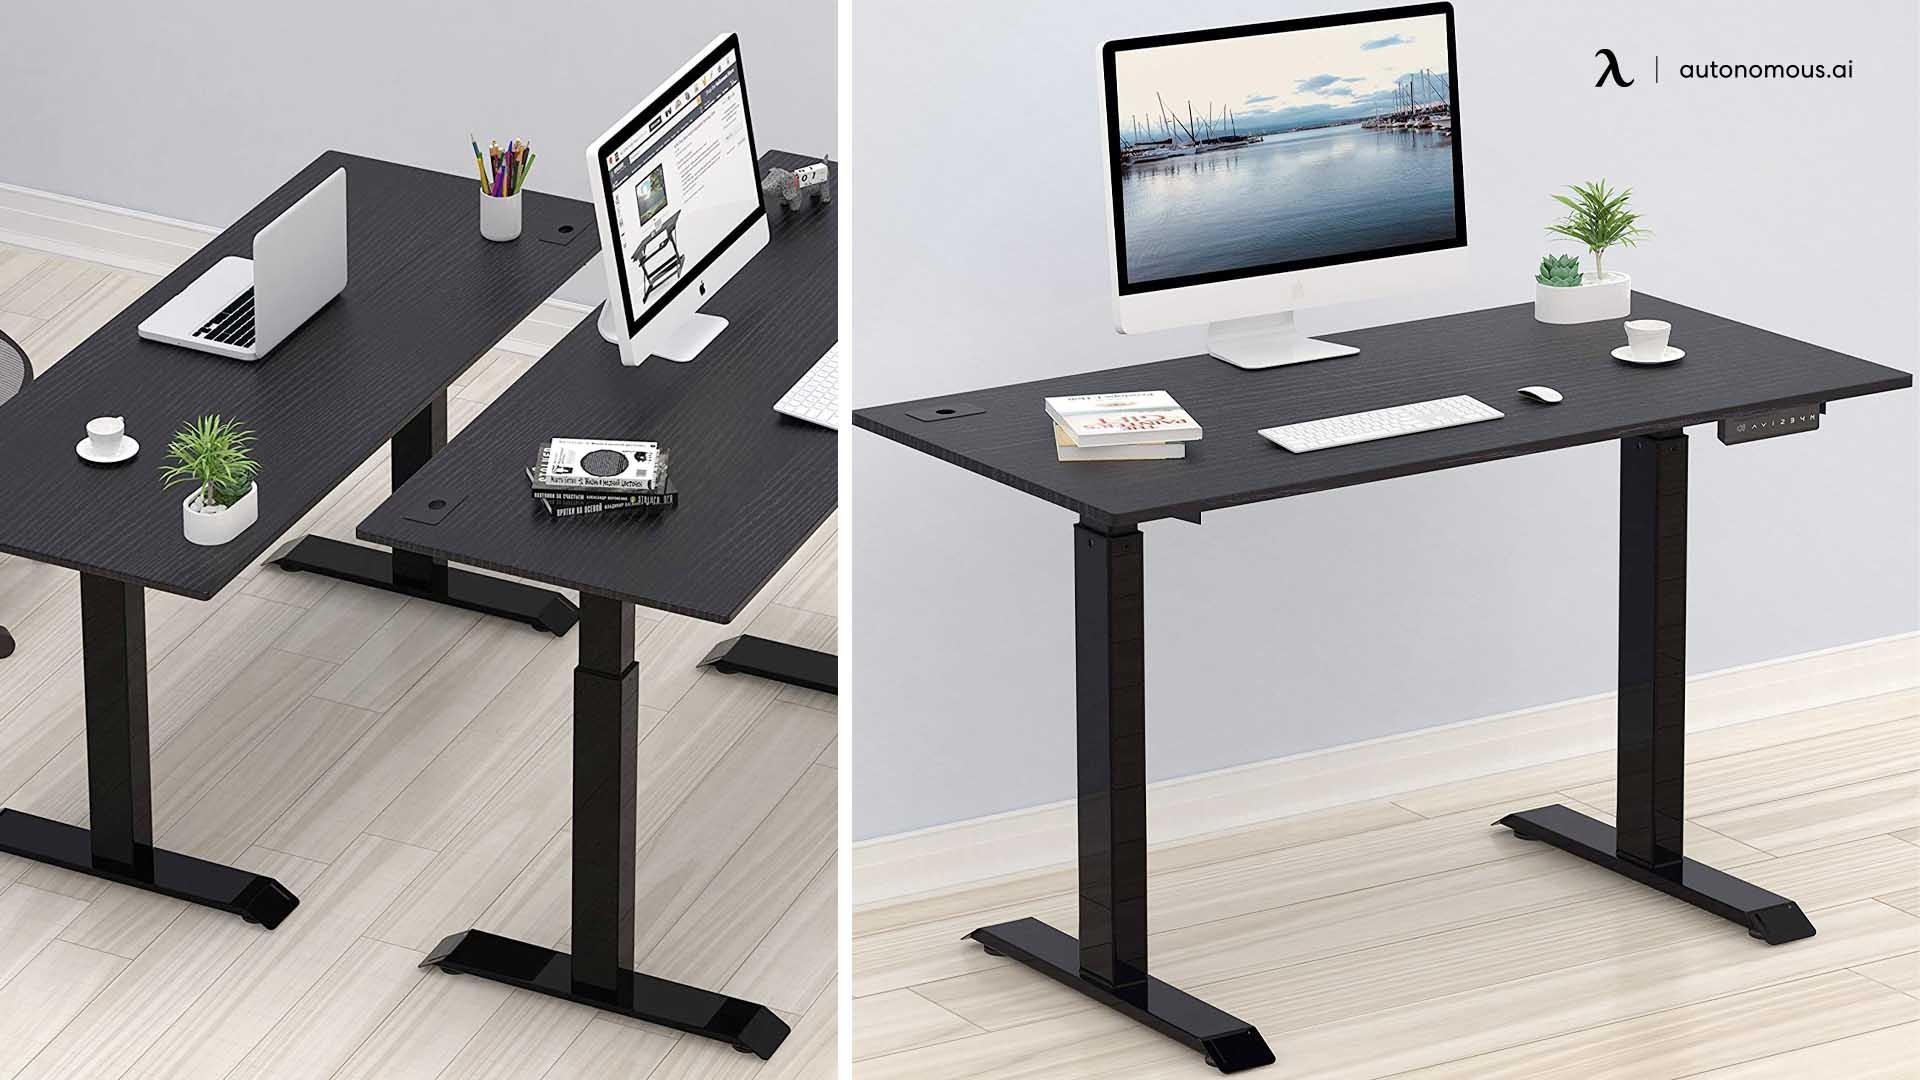 SHW standing desk